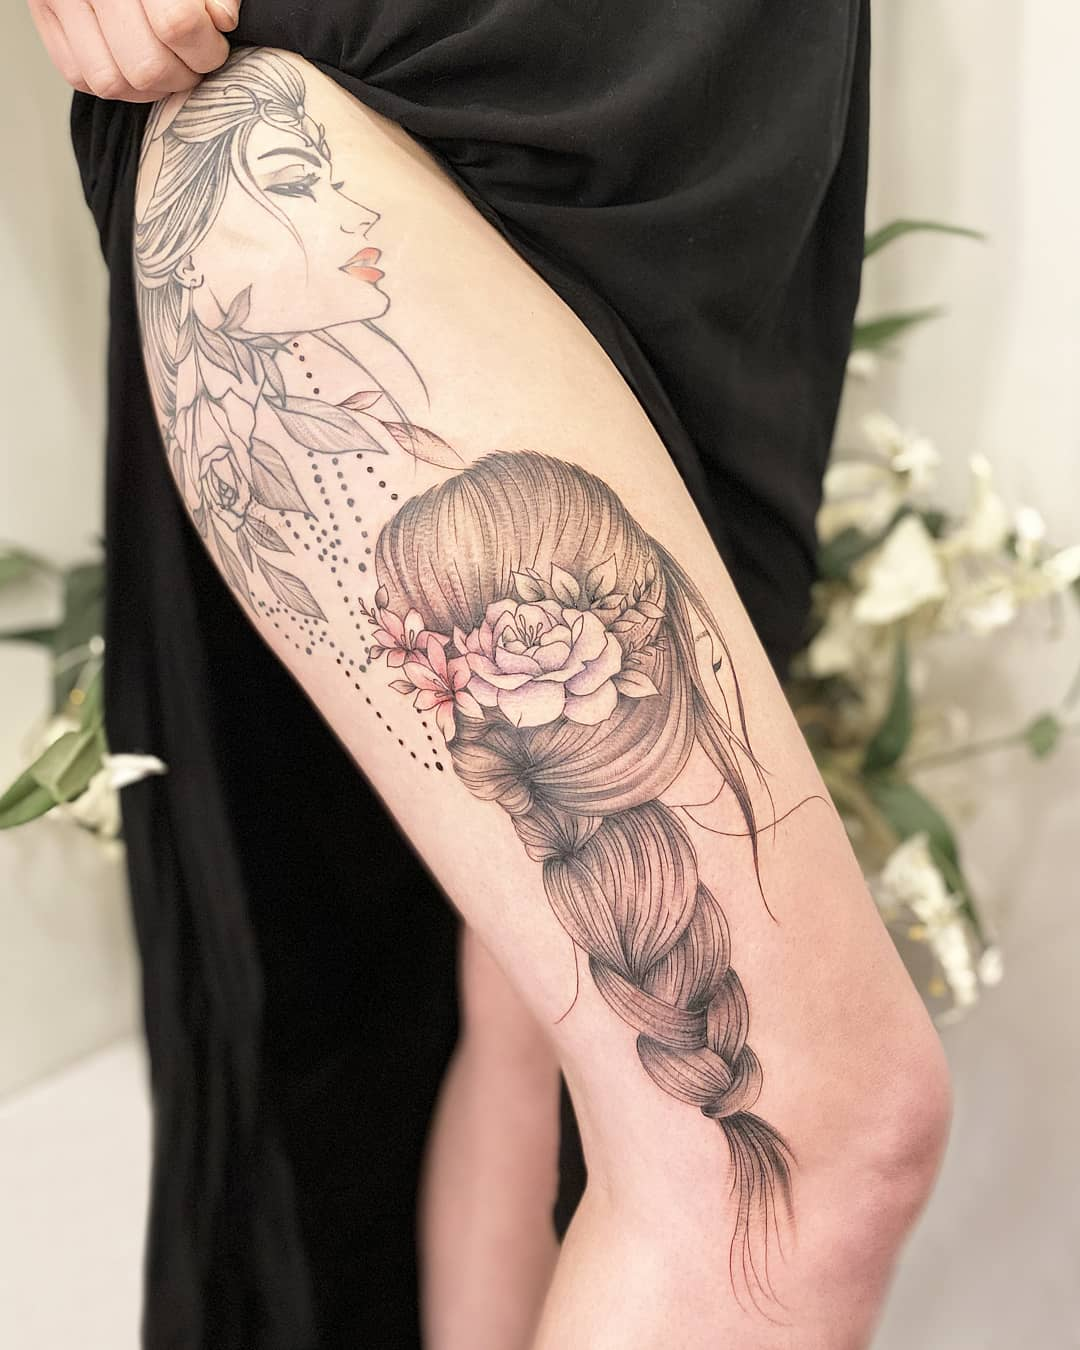 jamie-kan-tattoo-1